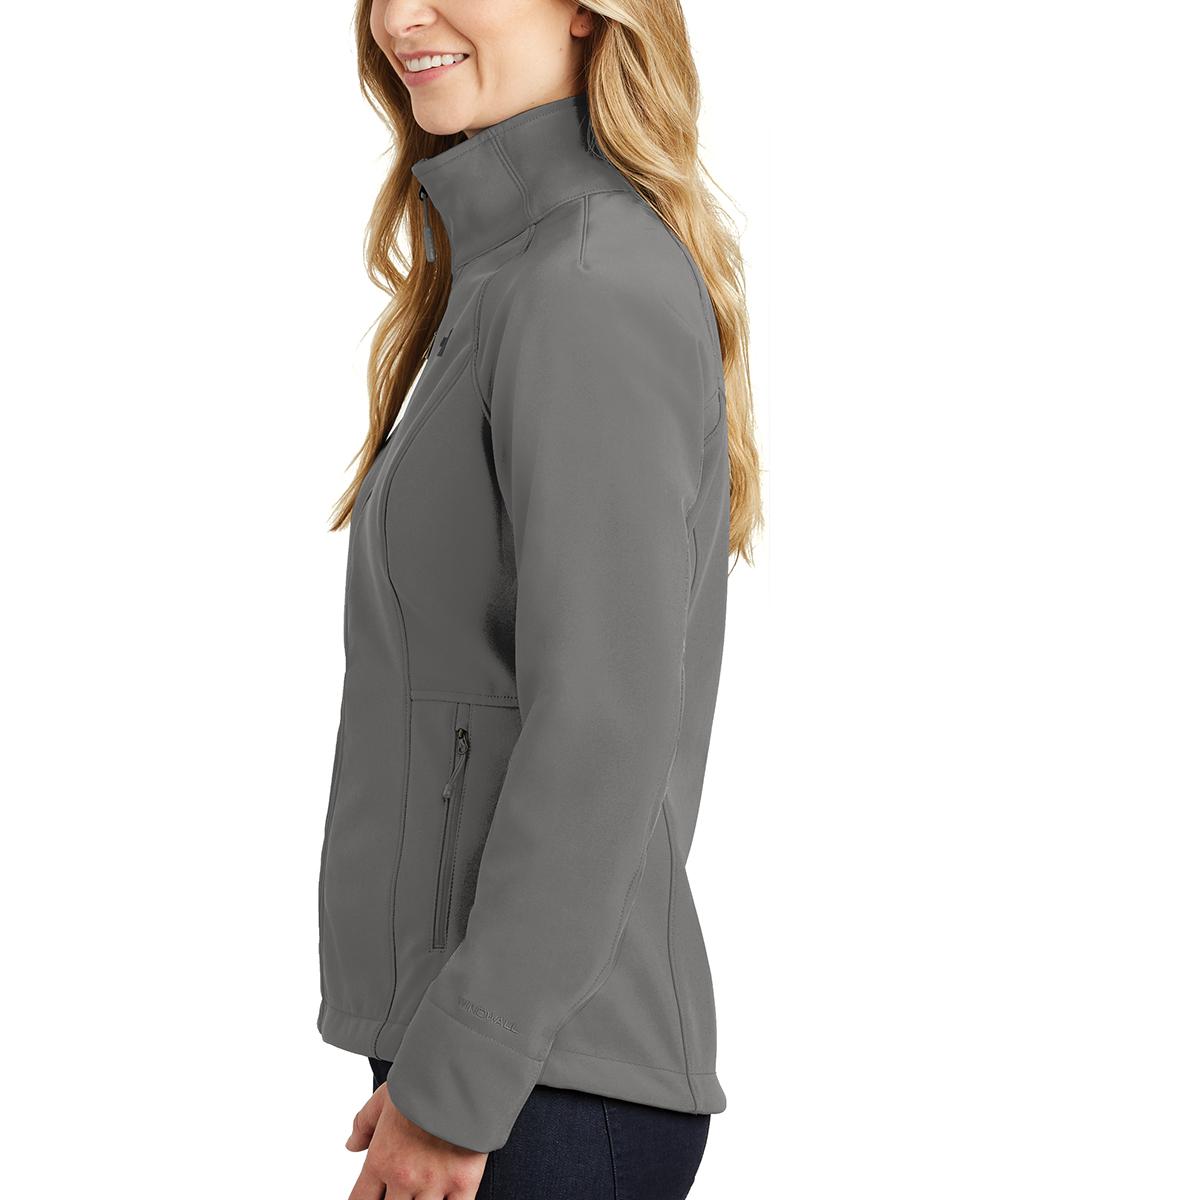 b3a6b4a0c NF0A3LGU The North Face® Ladies' Apex Barrier Soft Shell Jacket ...